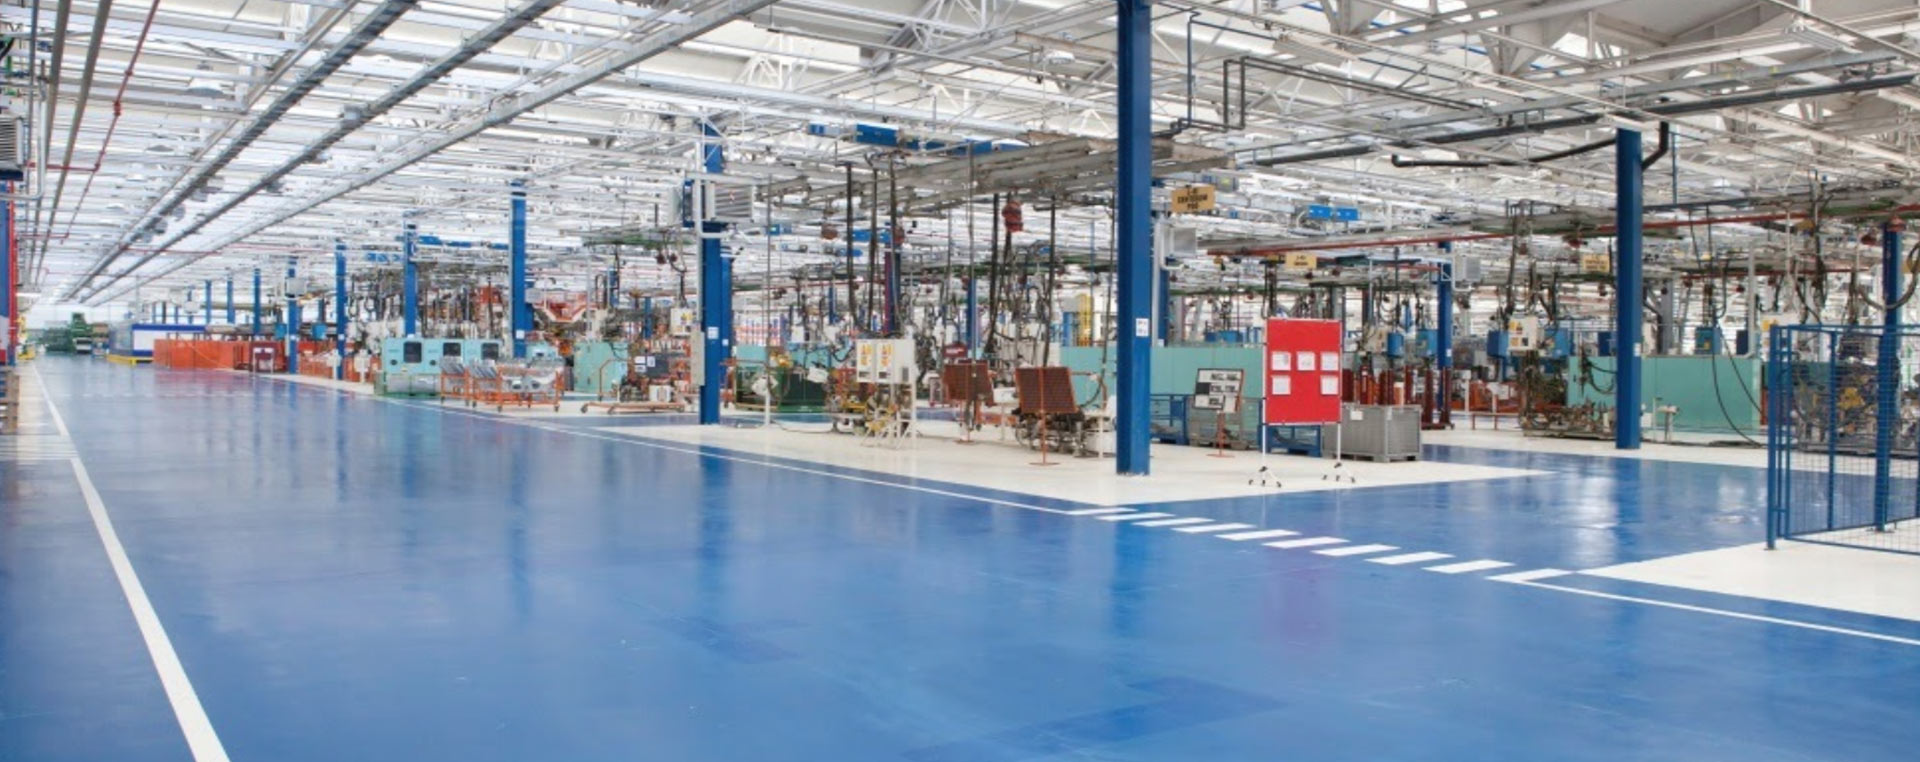 Nettoyage structure d'usine / Machinerie